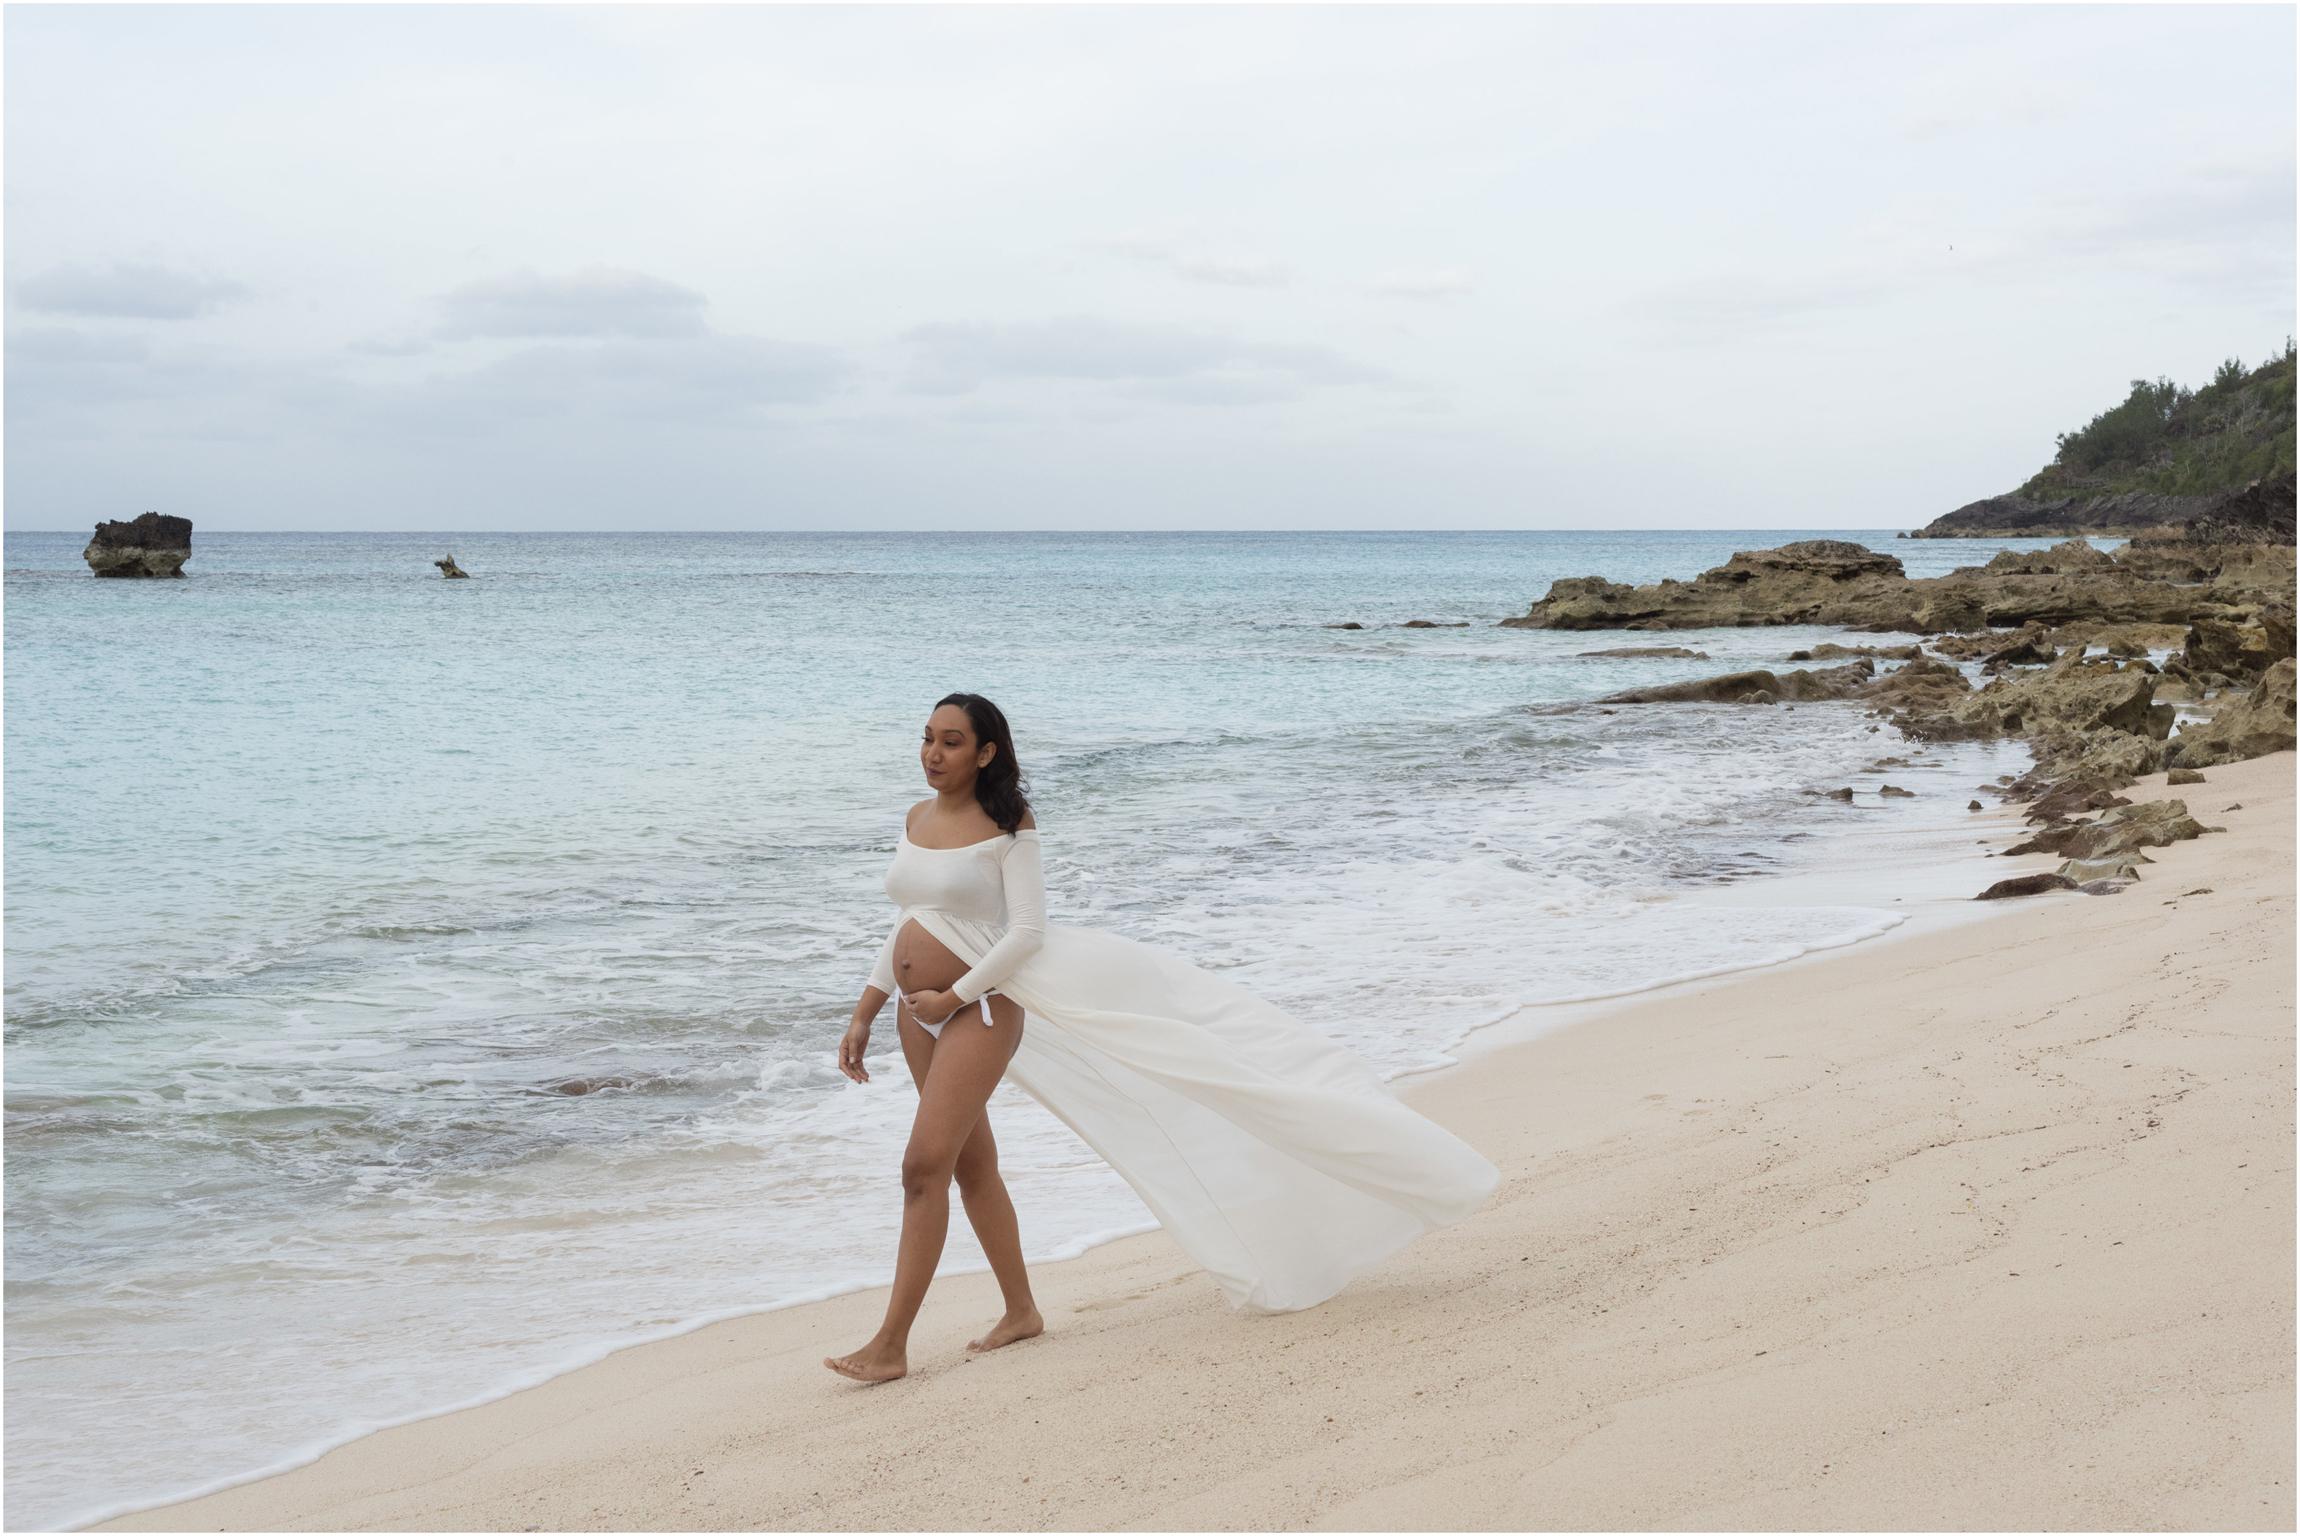 ©FianderFoto_Bermuda Maternity Photographer_Church Bay Beach_Tiffany_009.jpg